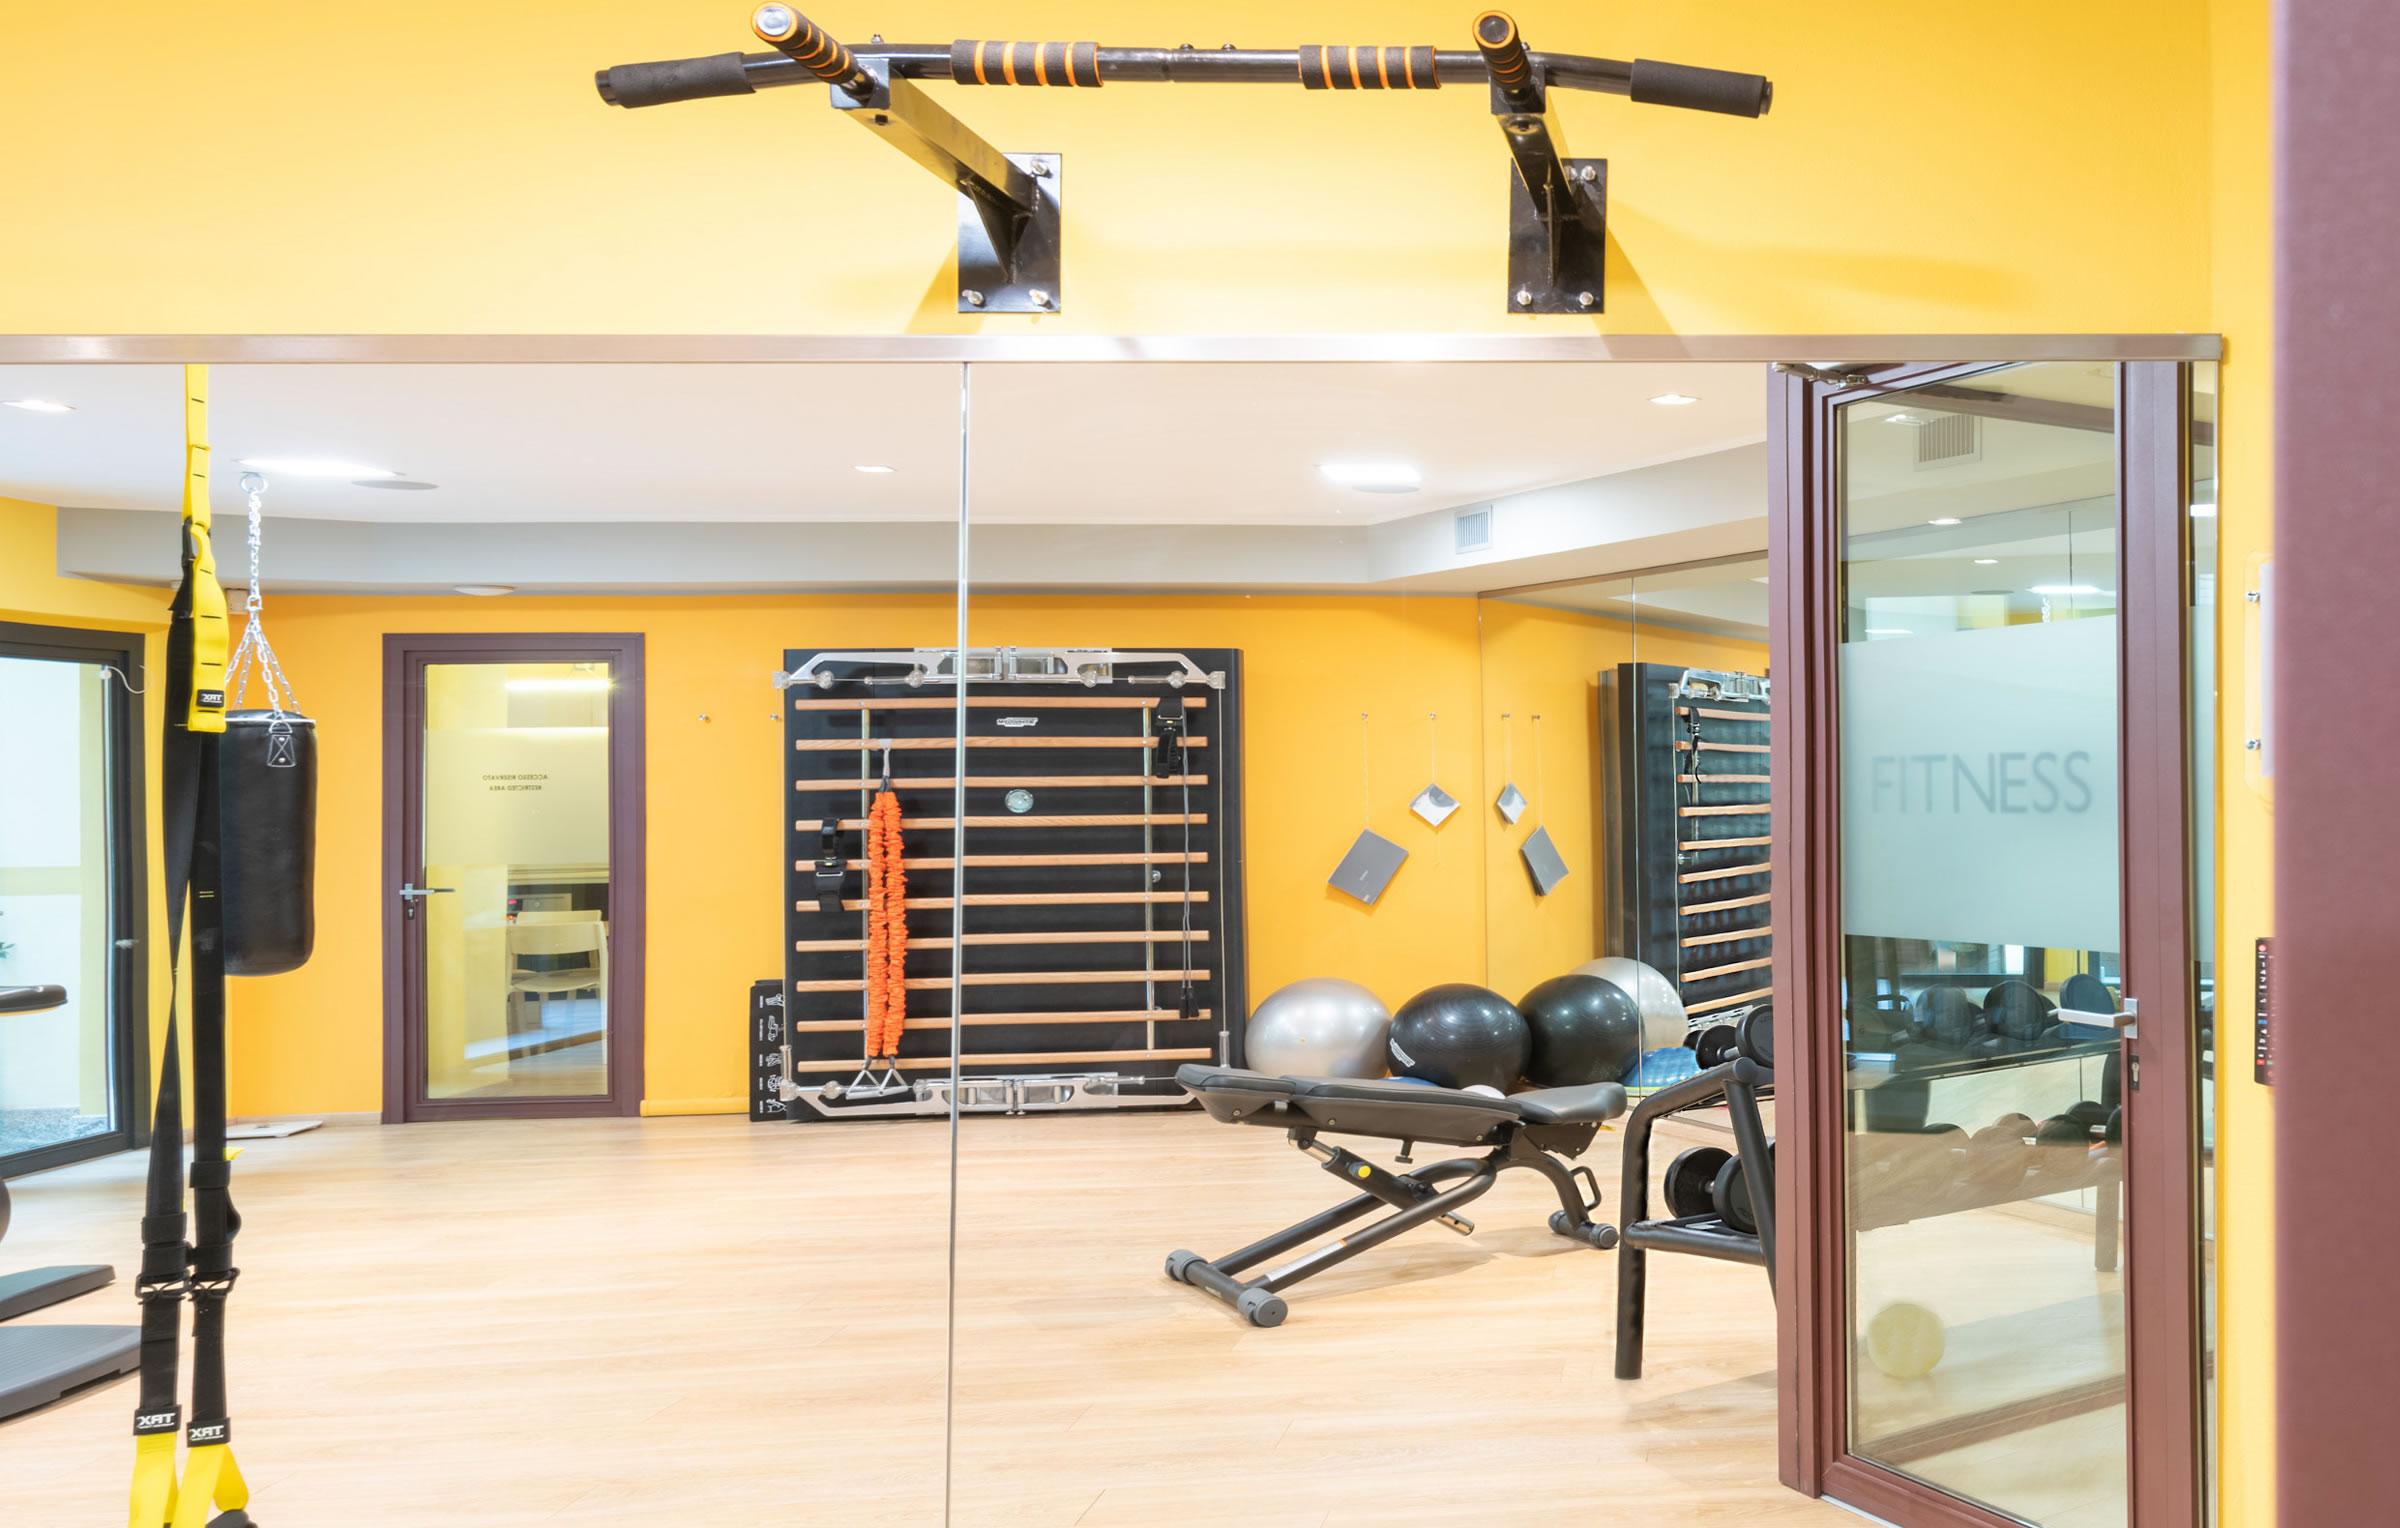 pesi, palla, elastici, kinesis, sacco box,tapis roulant, bike